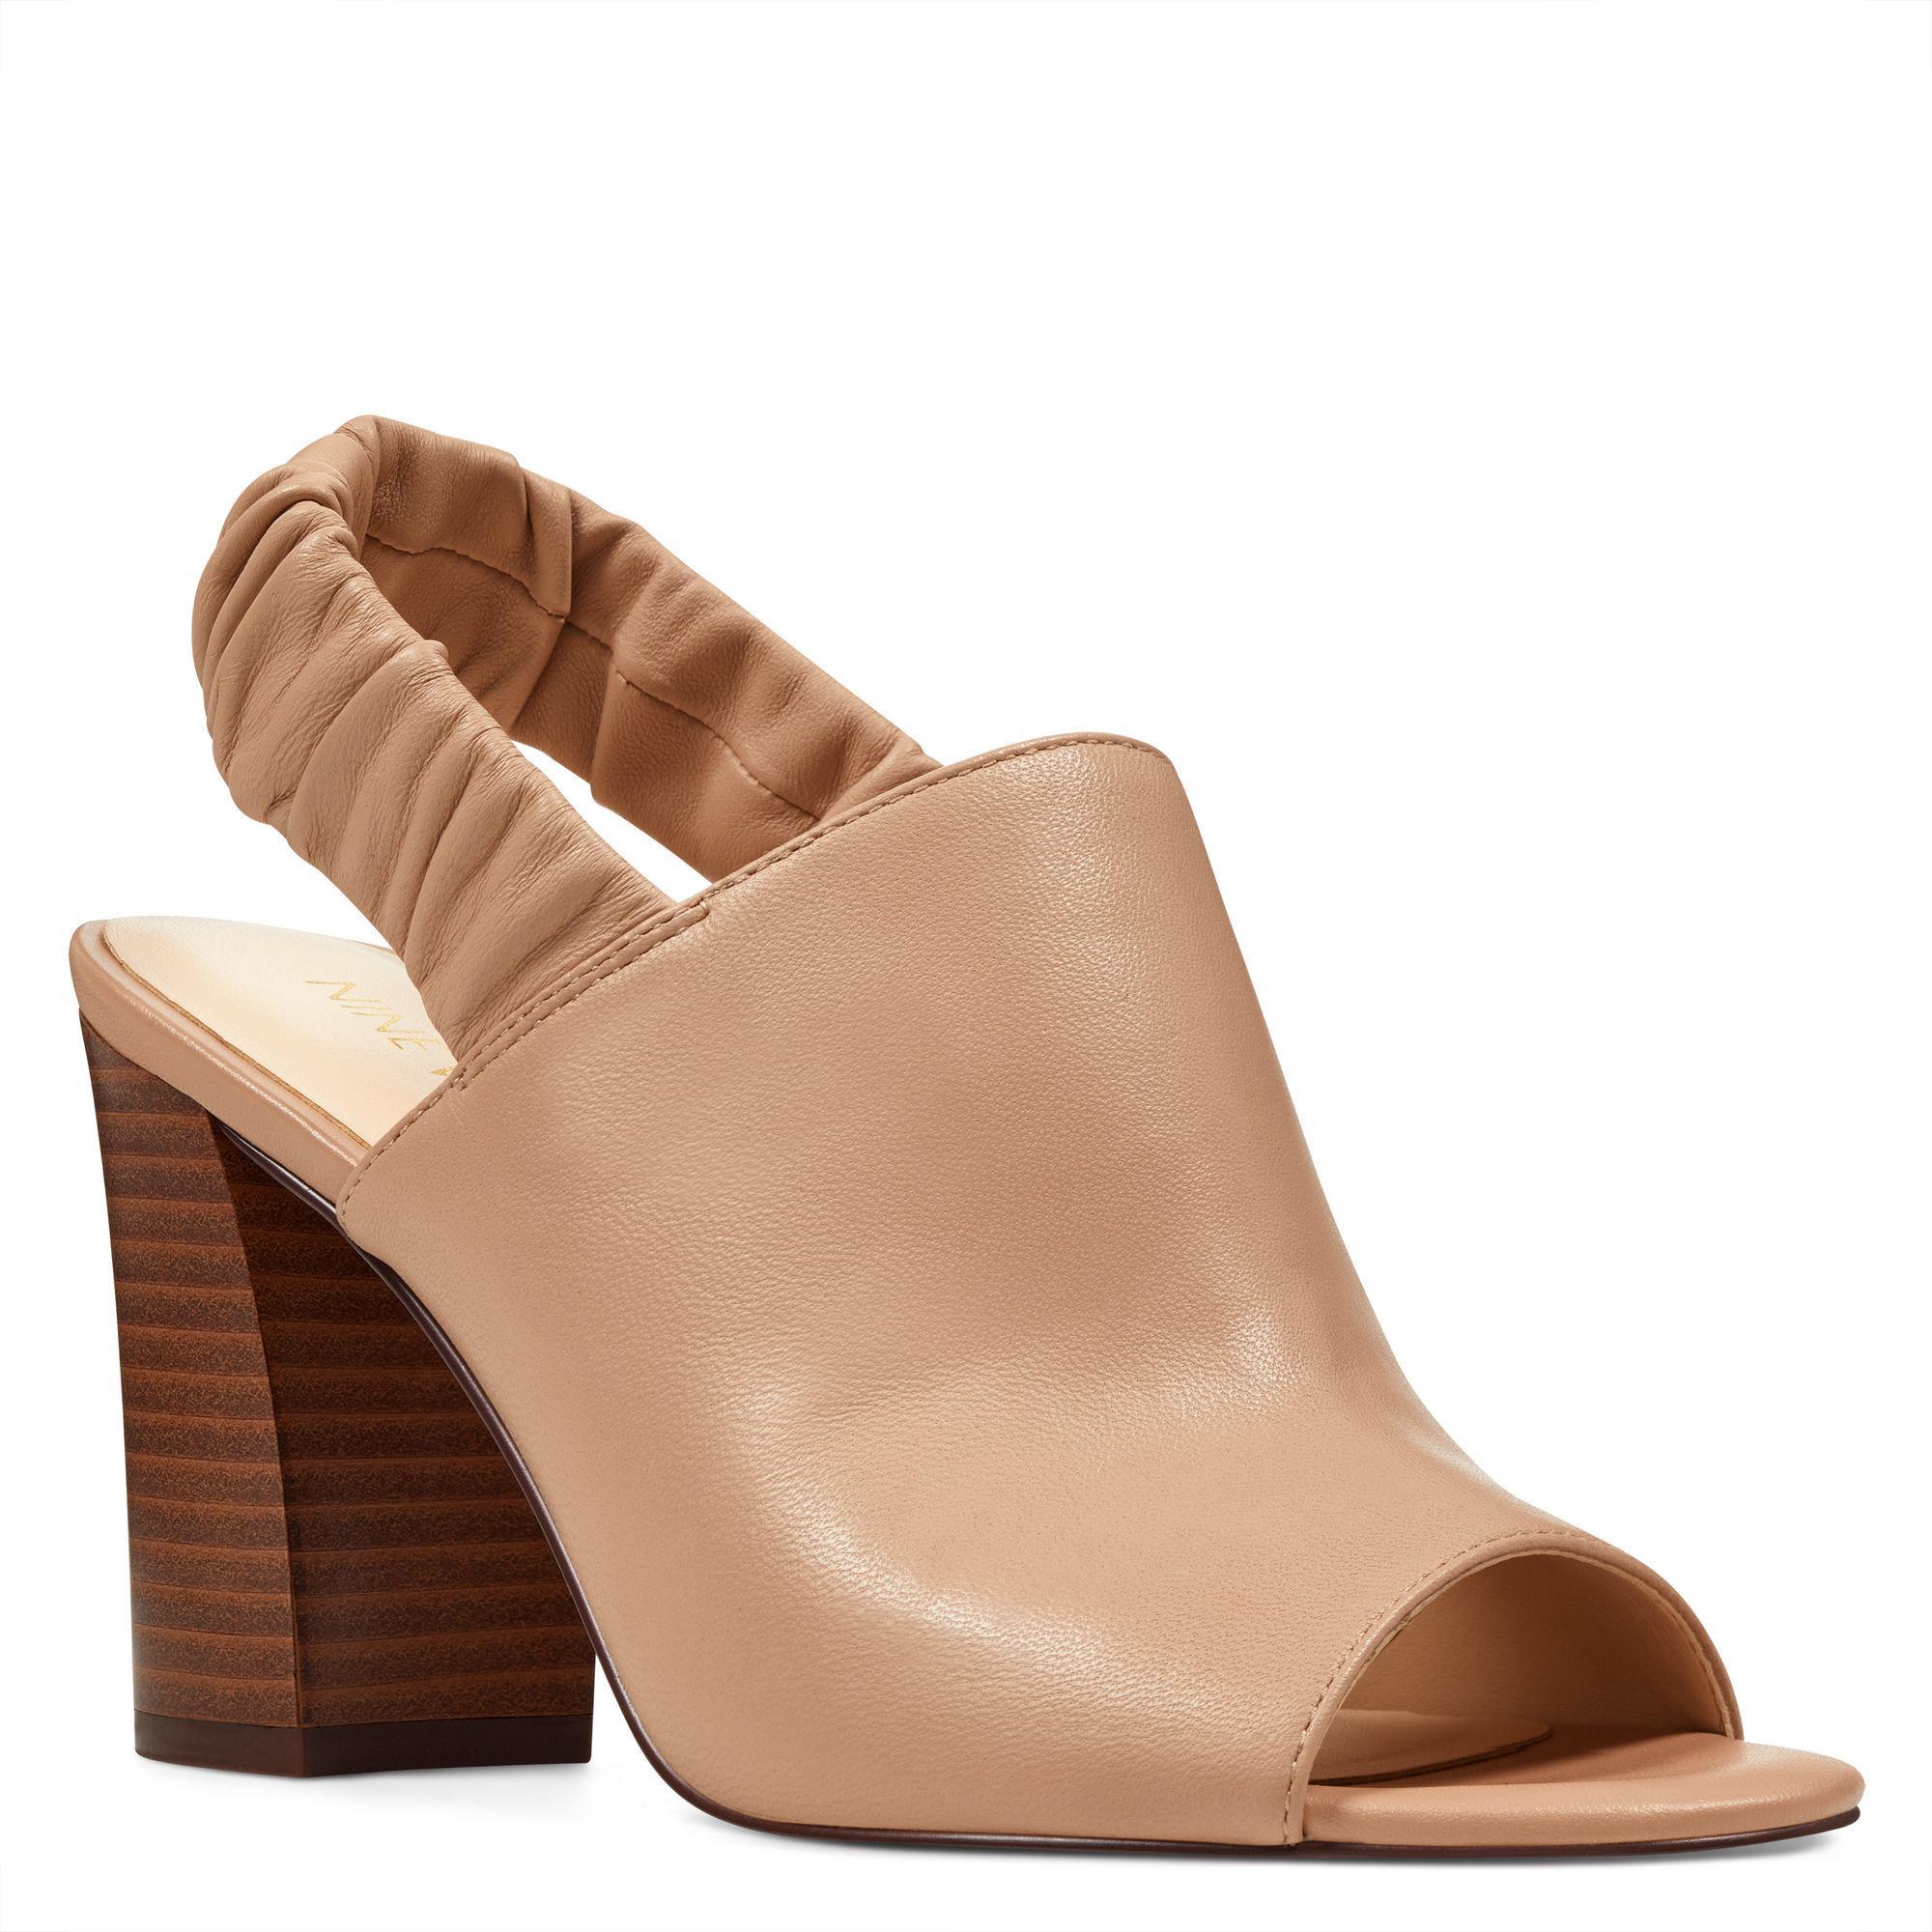 Nine West. Women's Hailamao Slingback Sandals